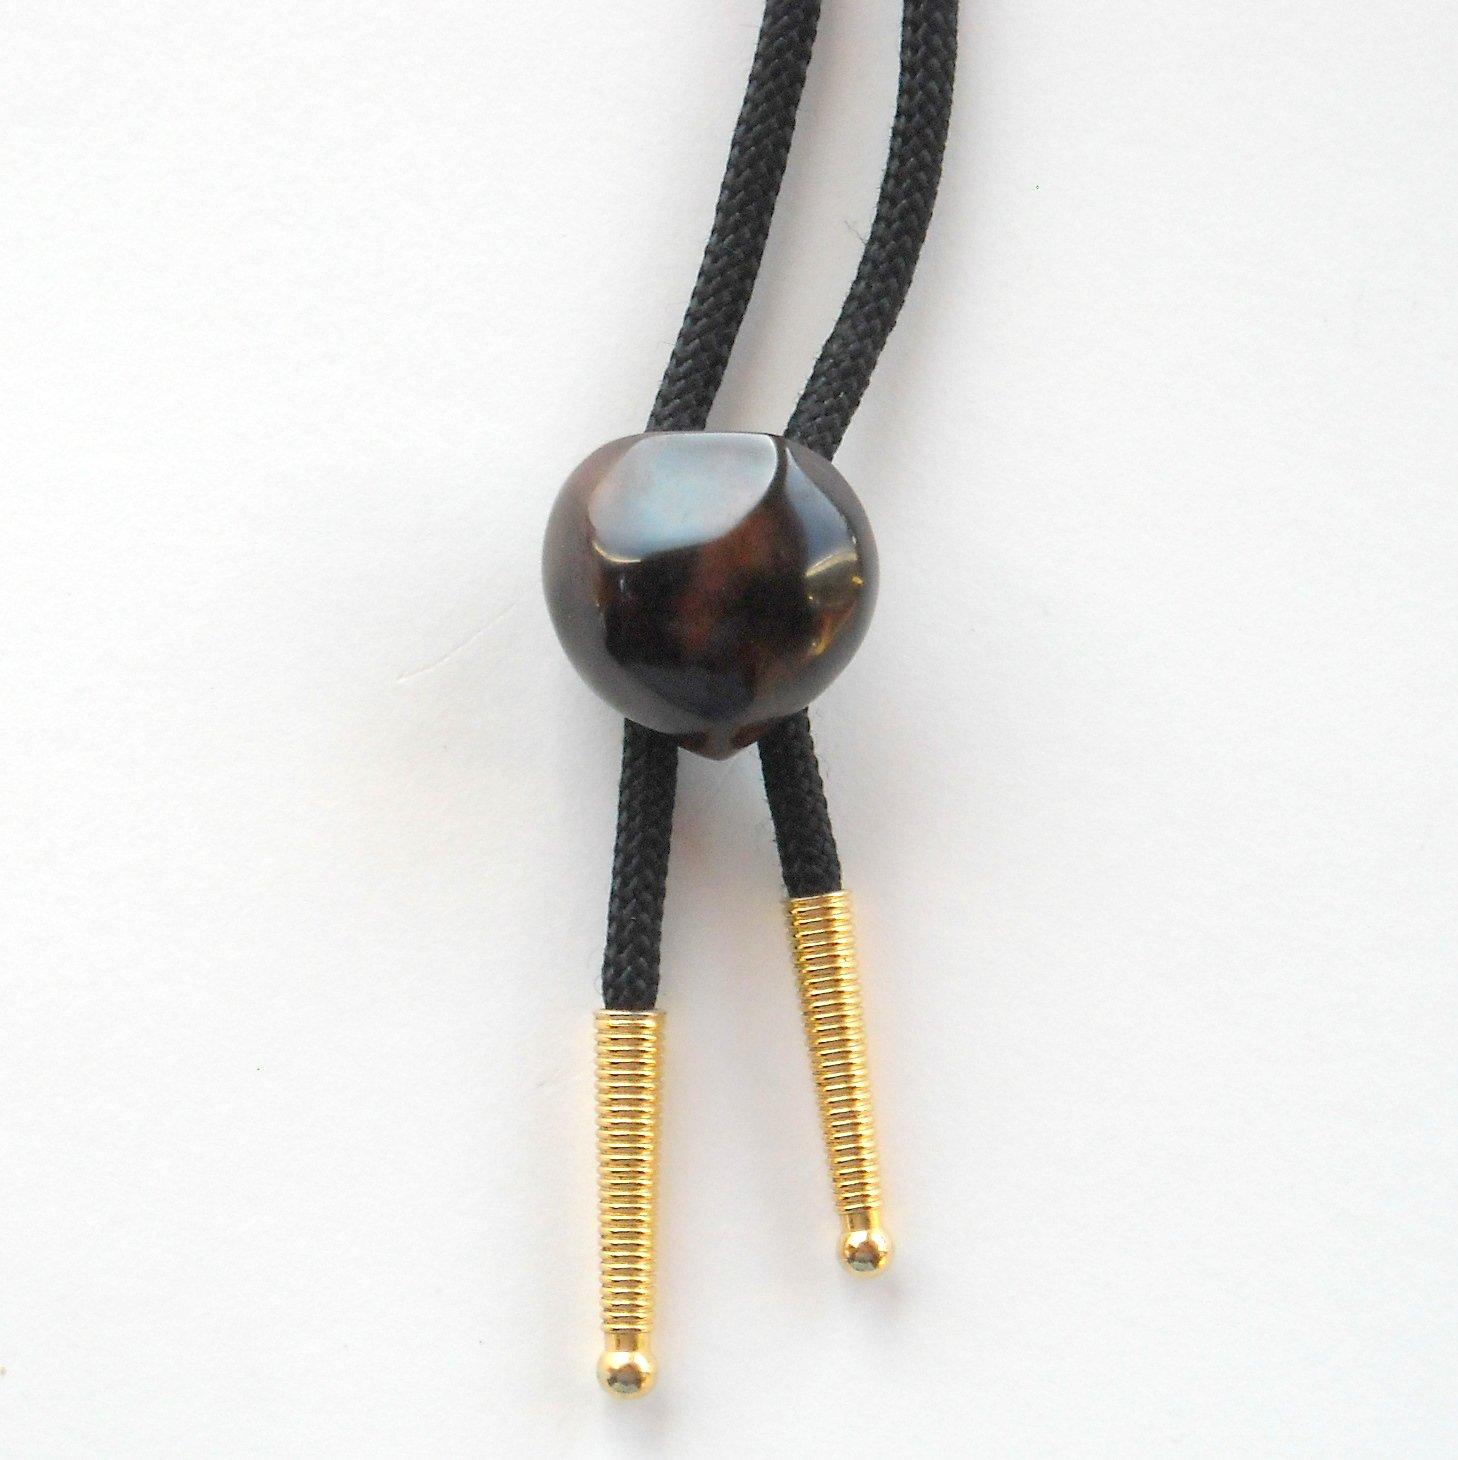 Vintage Brown Faux Rock Gold Tone Bootlace Bolo Tie